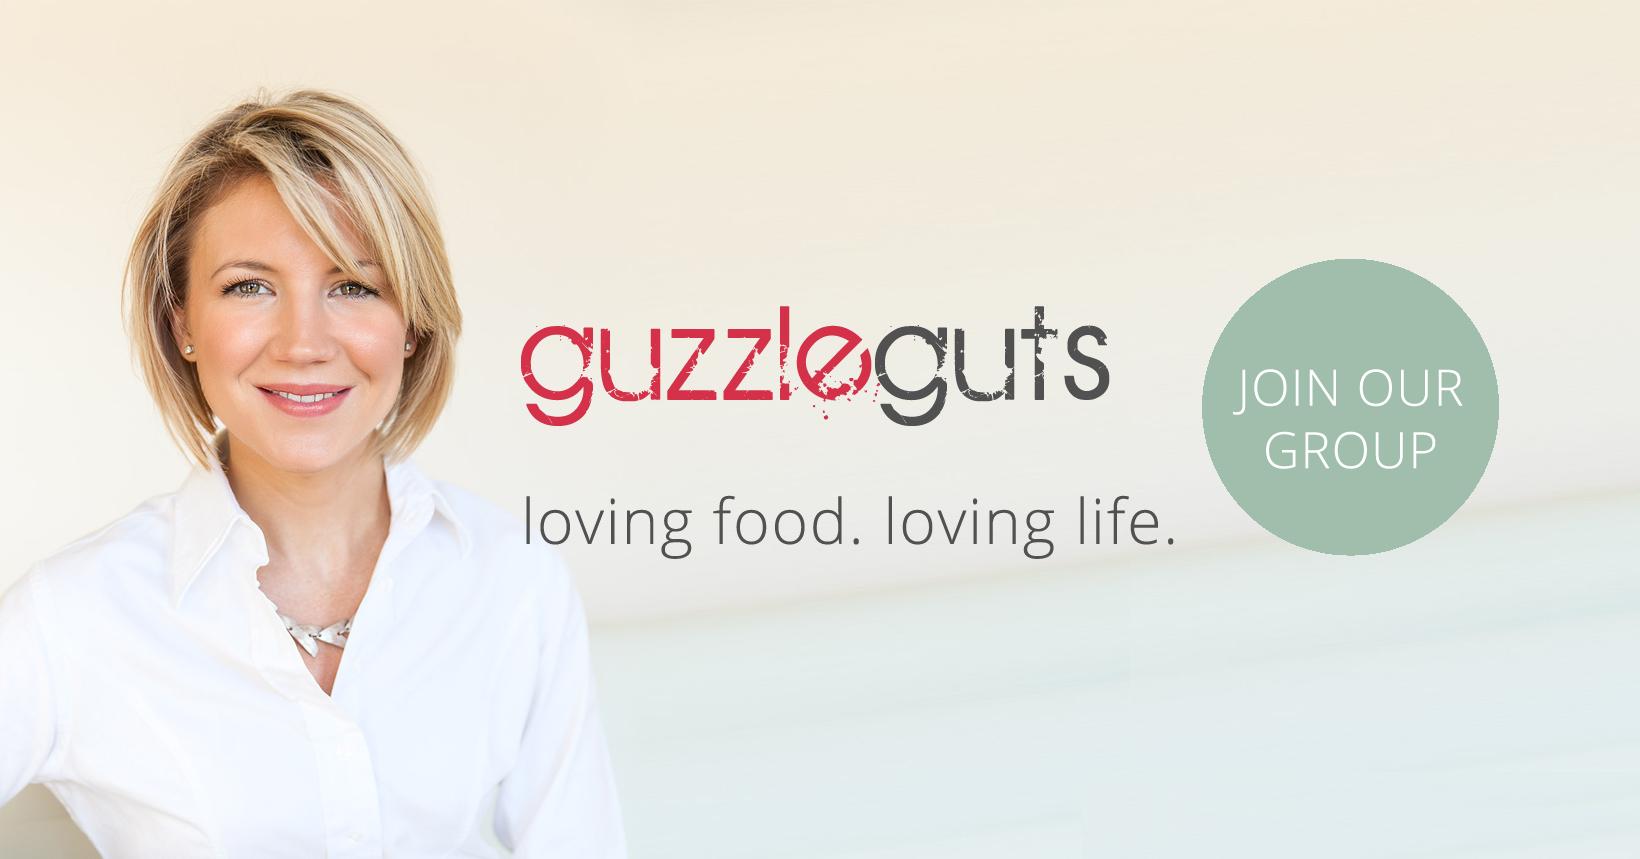 guzzle-guts-fb-banner.jpg